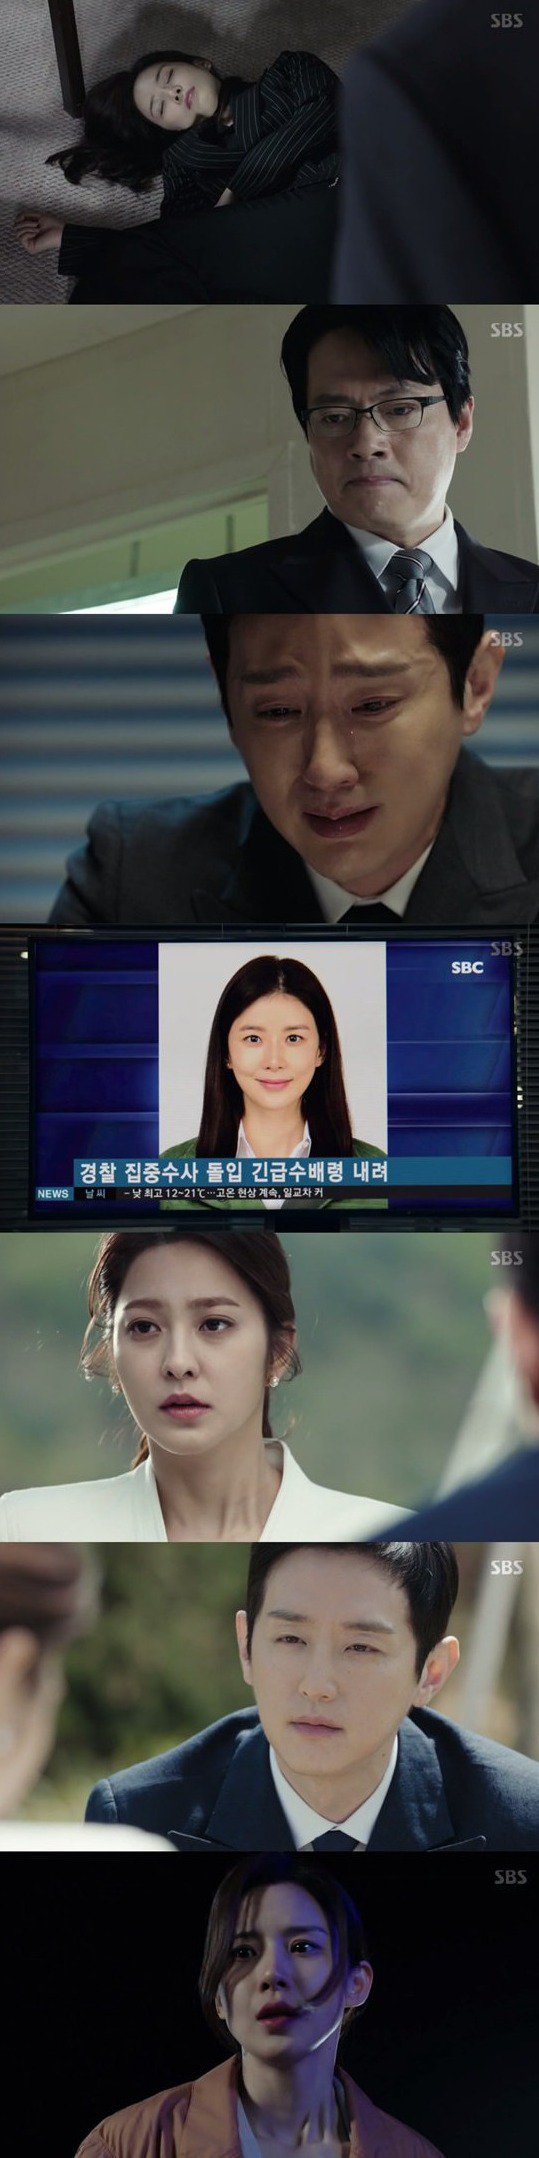 sbs korean news